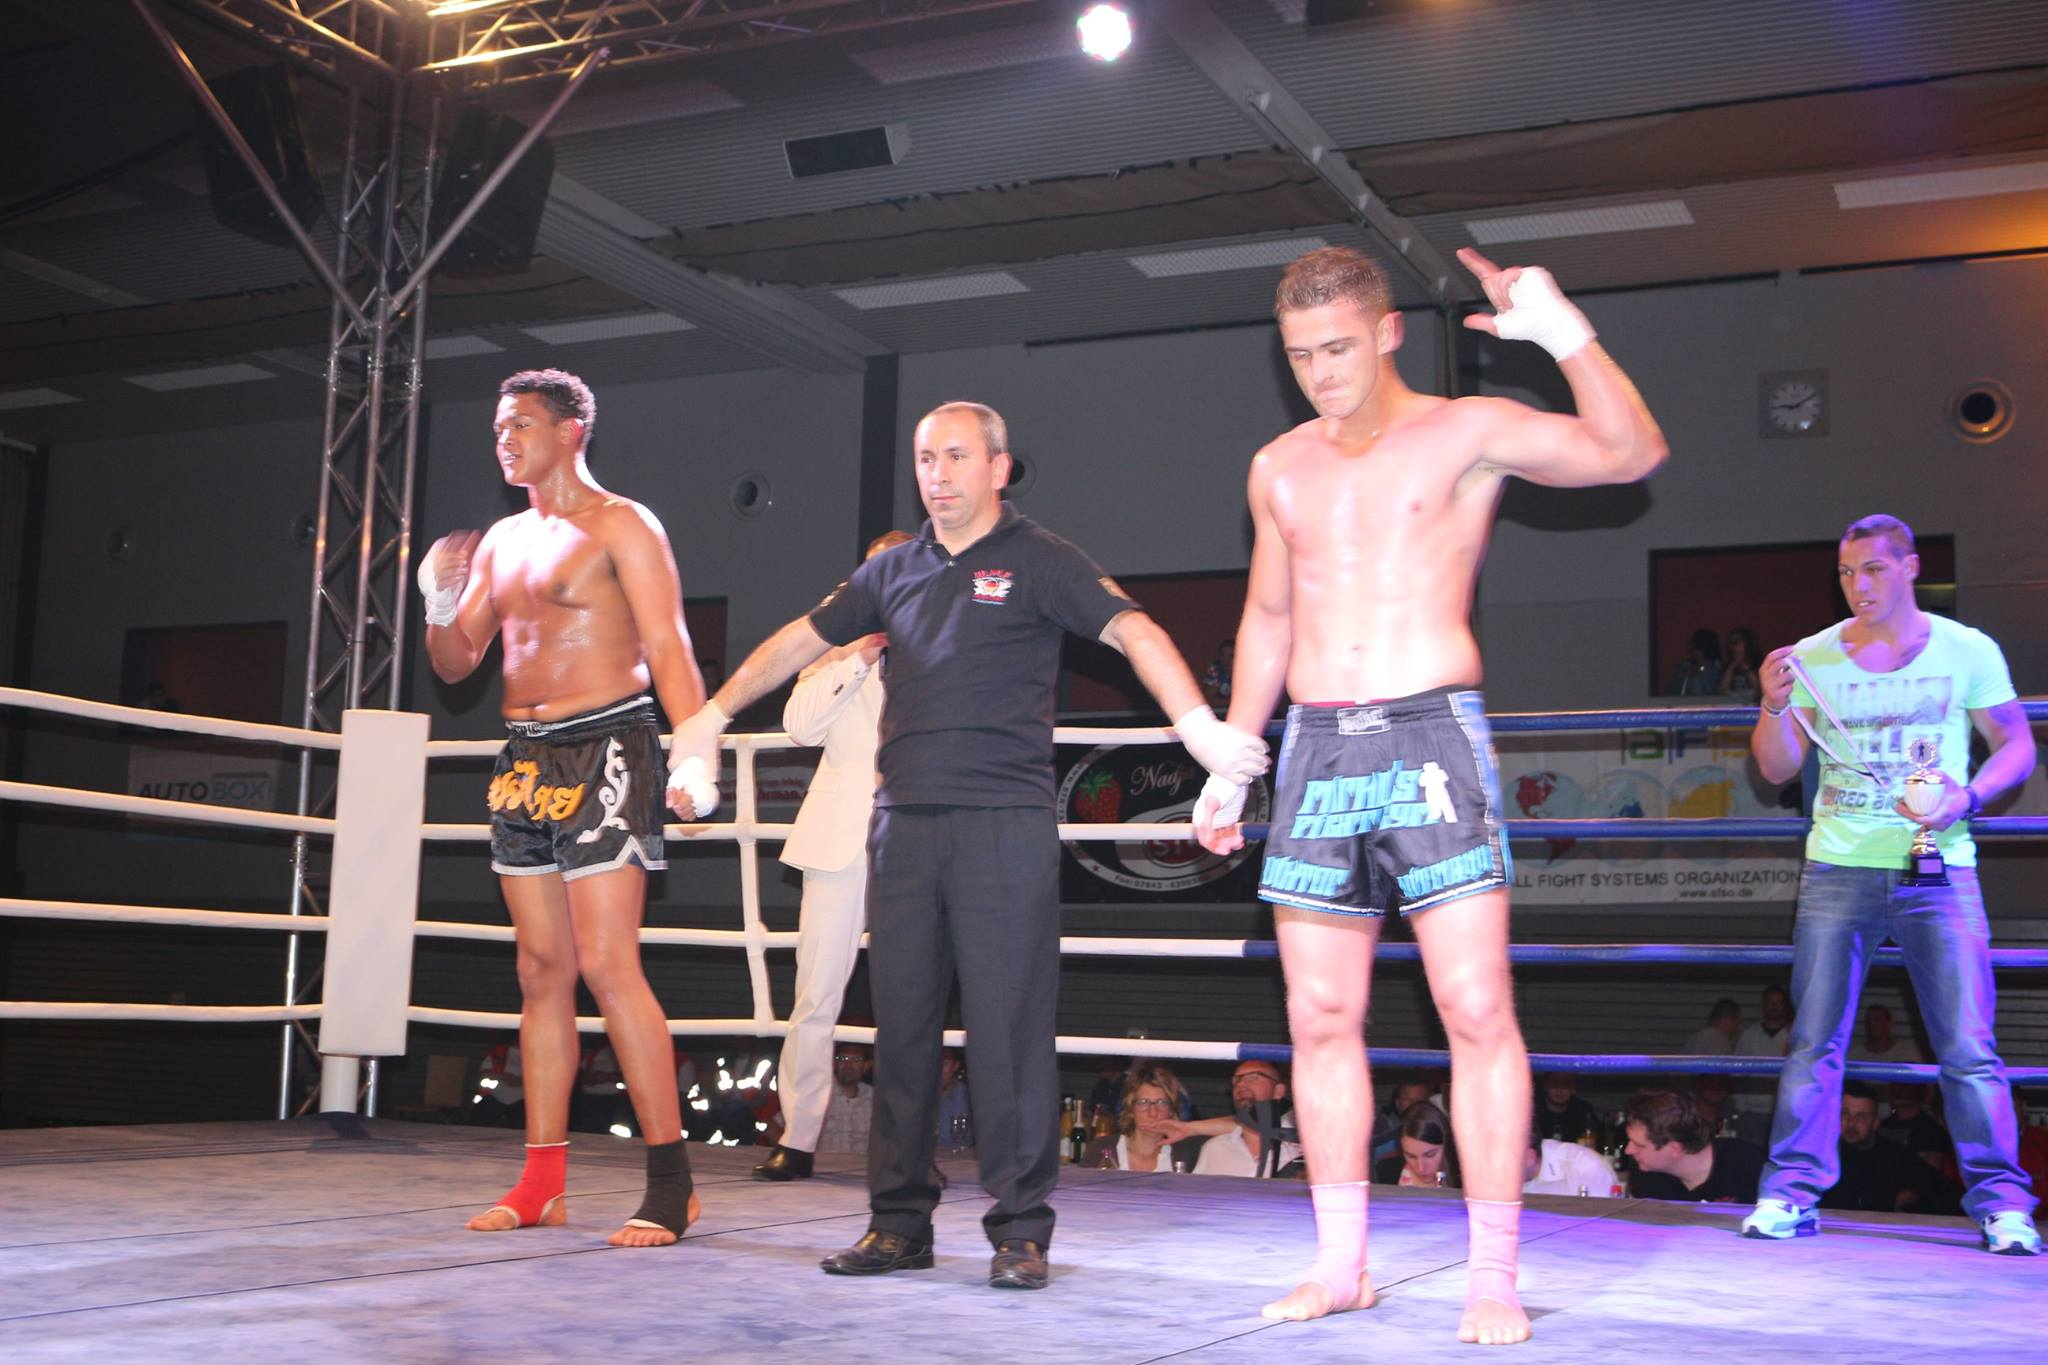 Mirkos Fihgt Night, Schutterwald, Offenburg, Kickboxen, K1, MMA-10